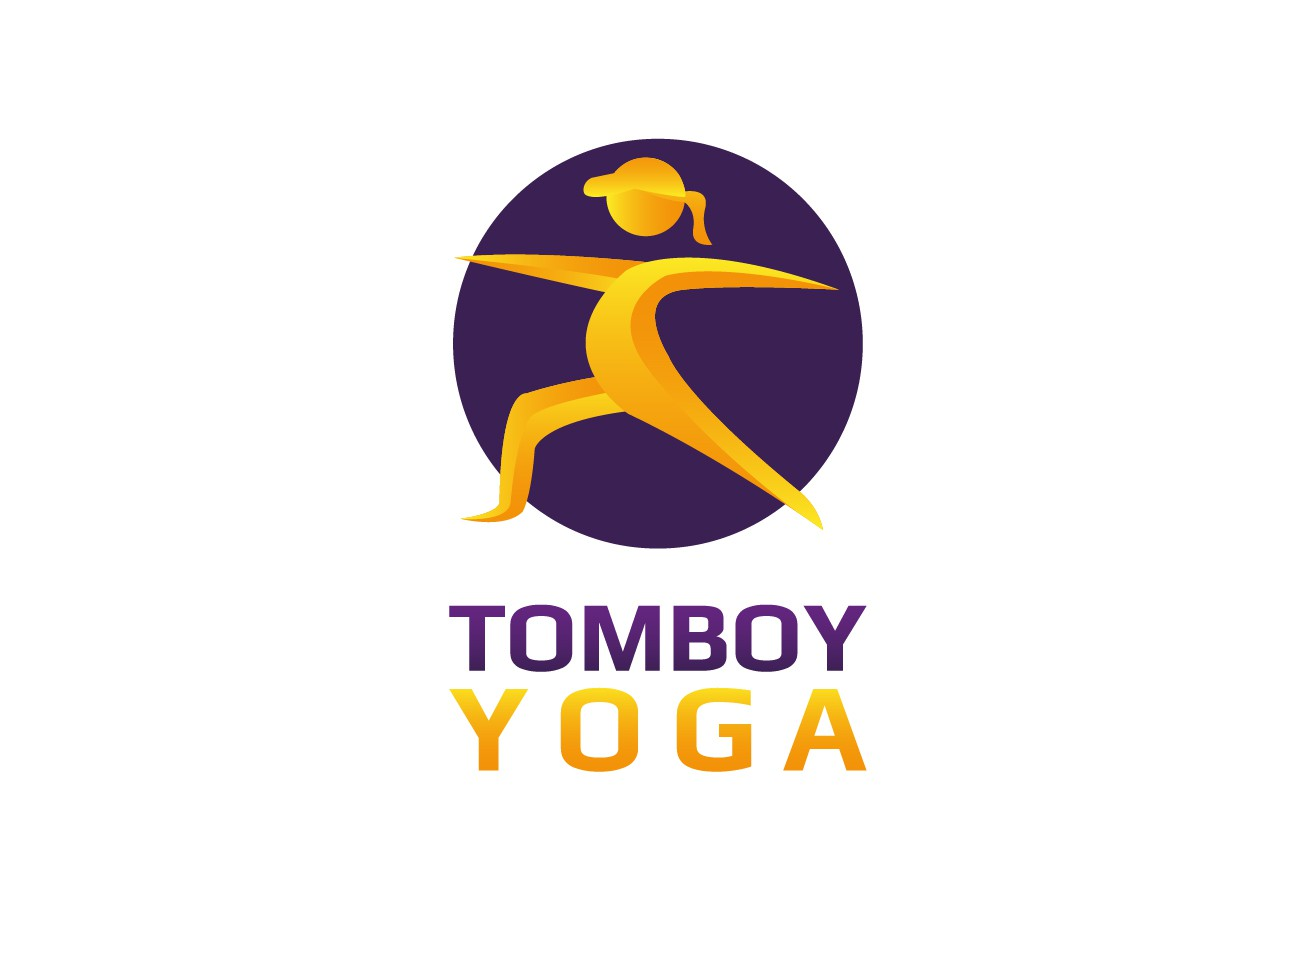 logo for Tomboy Yoga